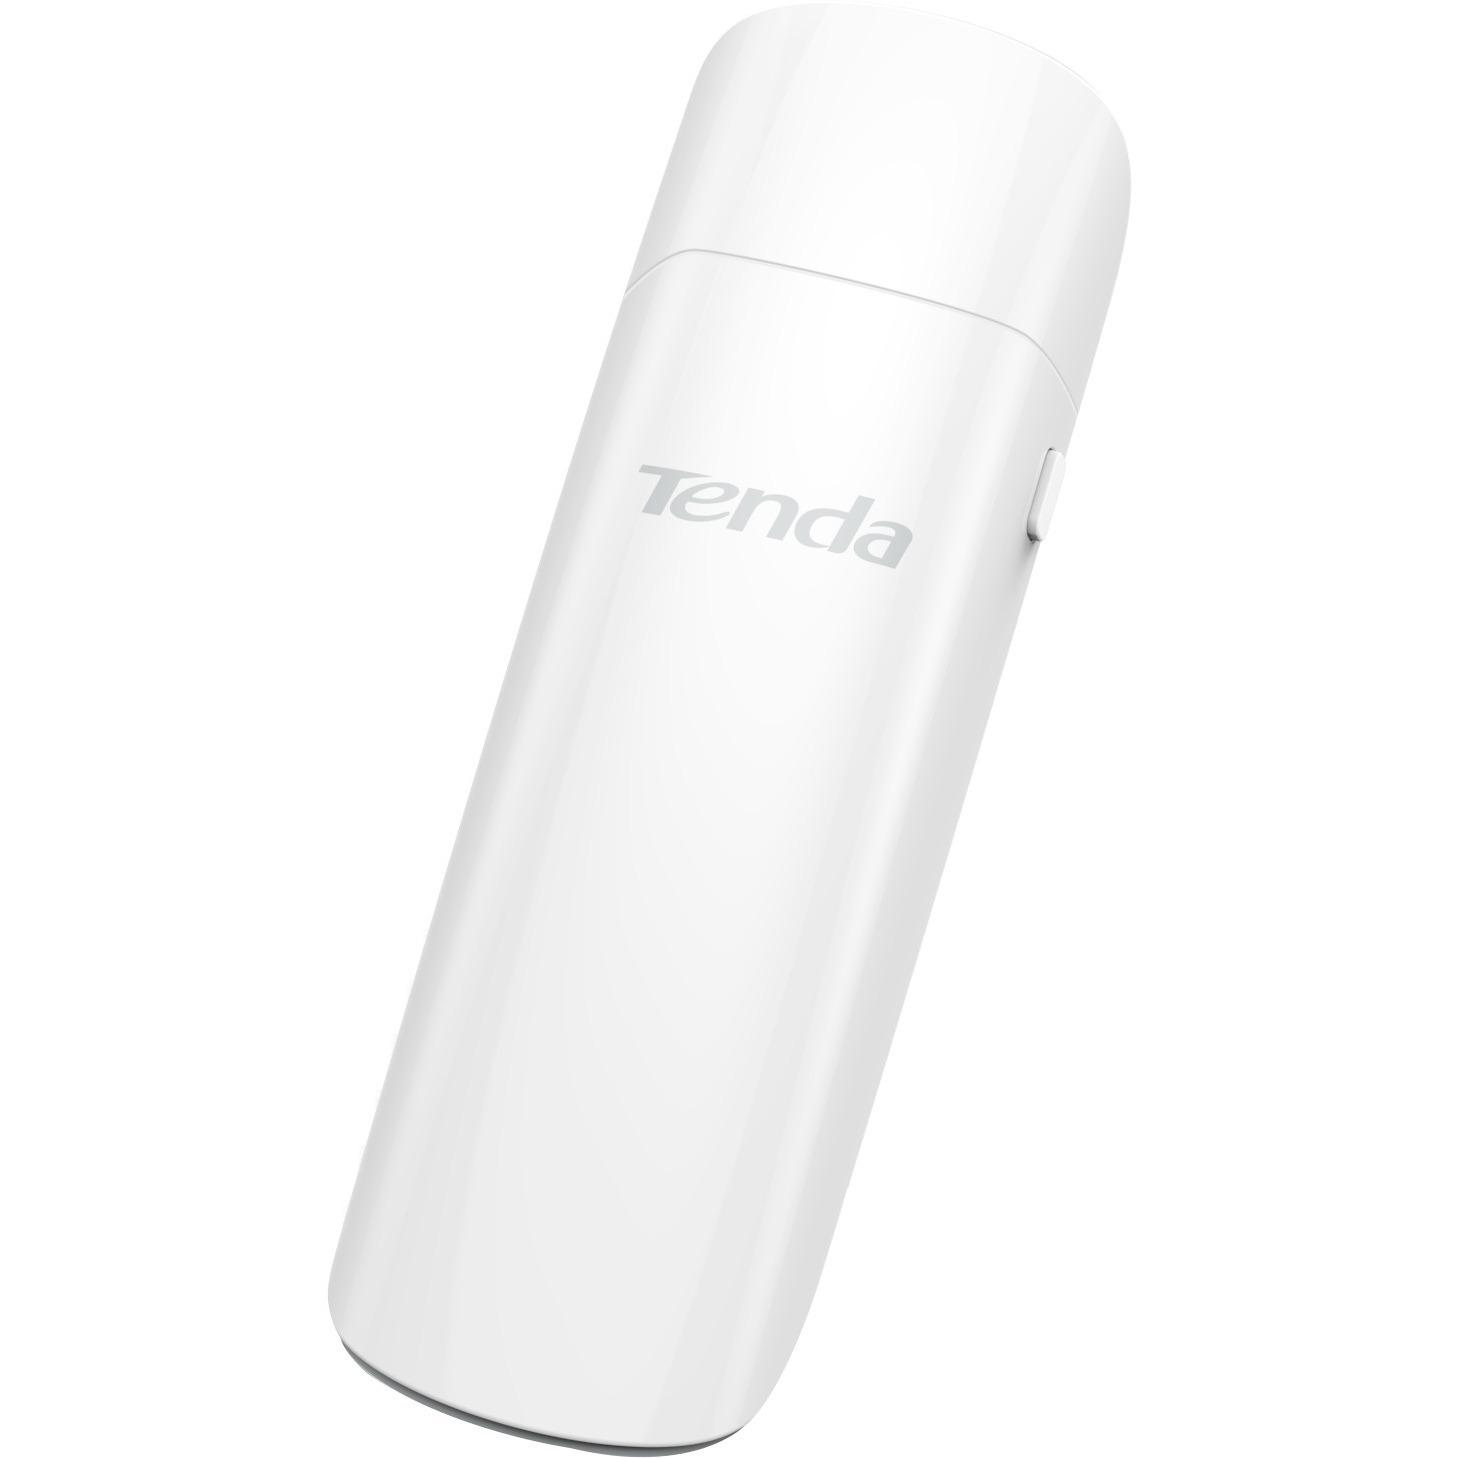 Tenda U12 IEEE 802.11ac - Wi-Fi Adapter - USB 3.0 - 1.27 Gbit/s - 2.40 GHz ISM - 5 GHz UNII - External